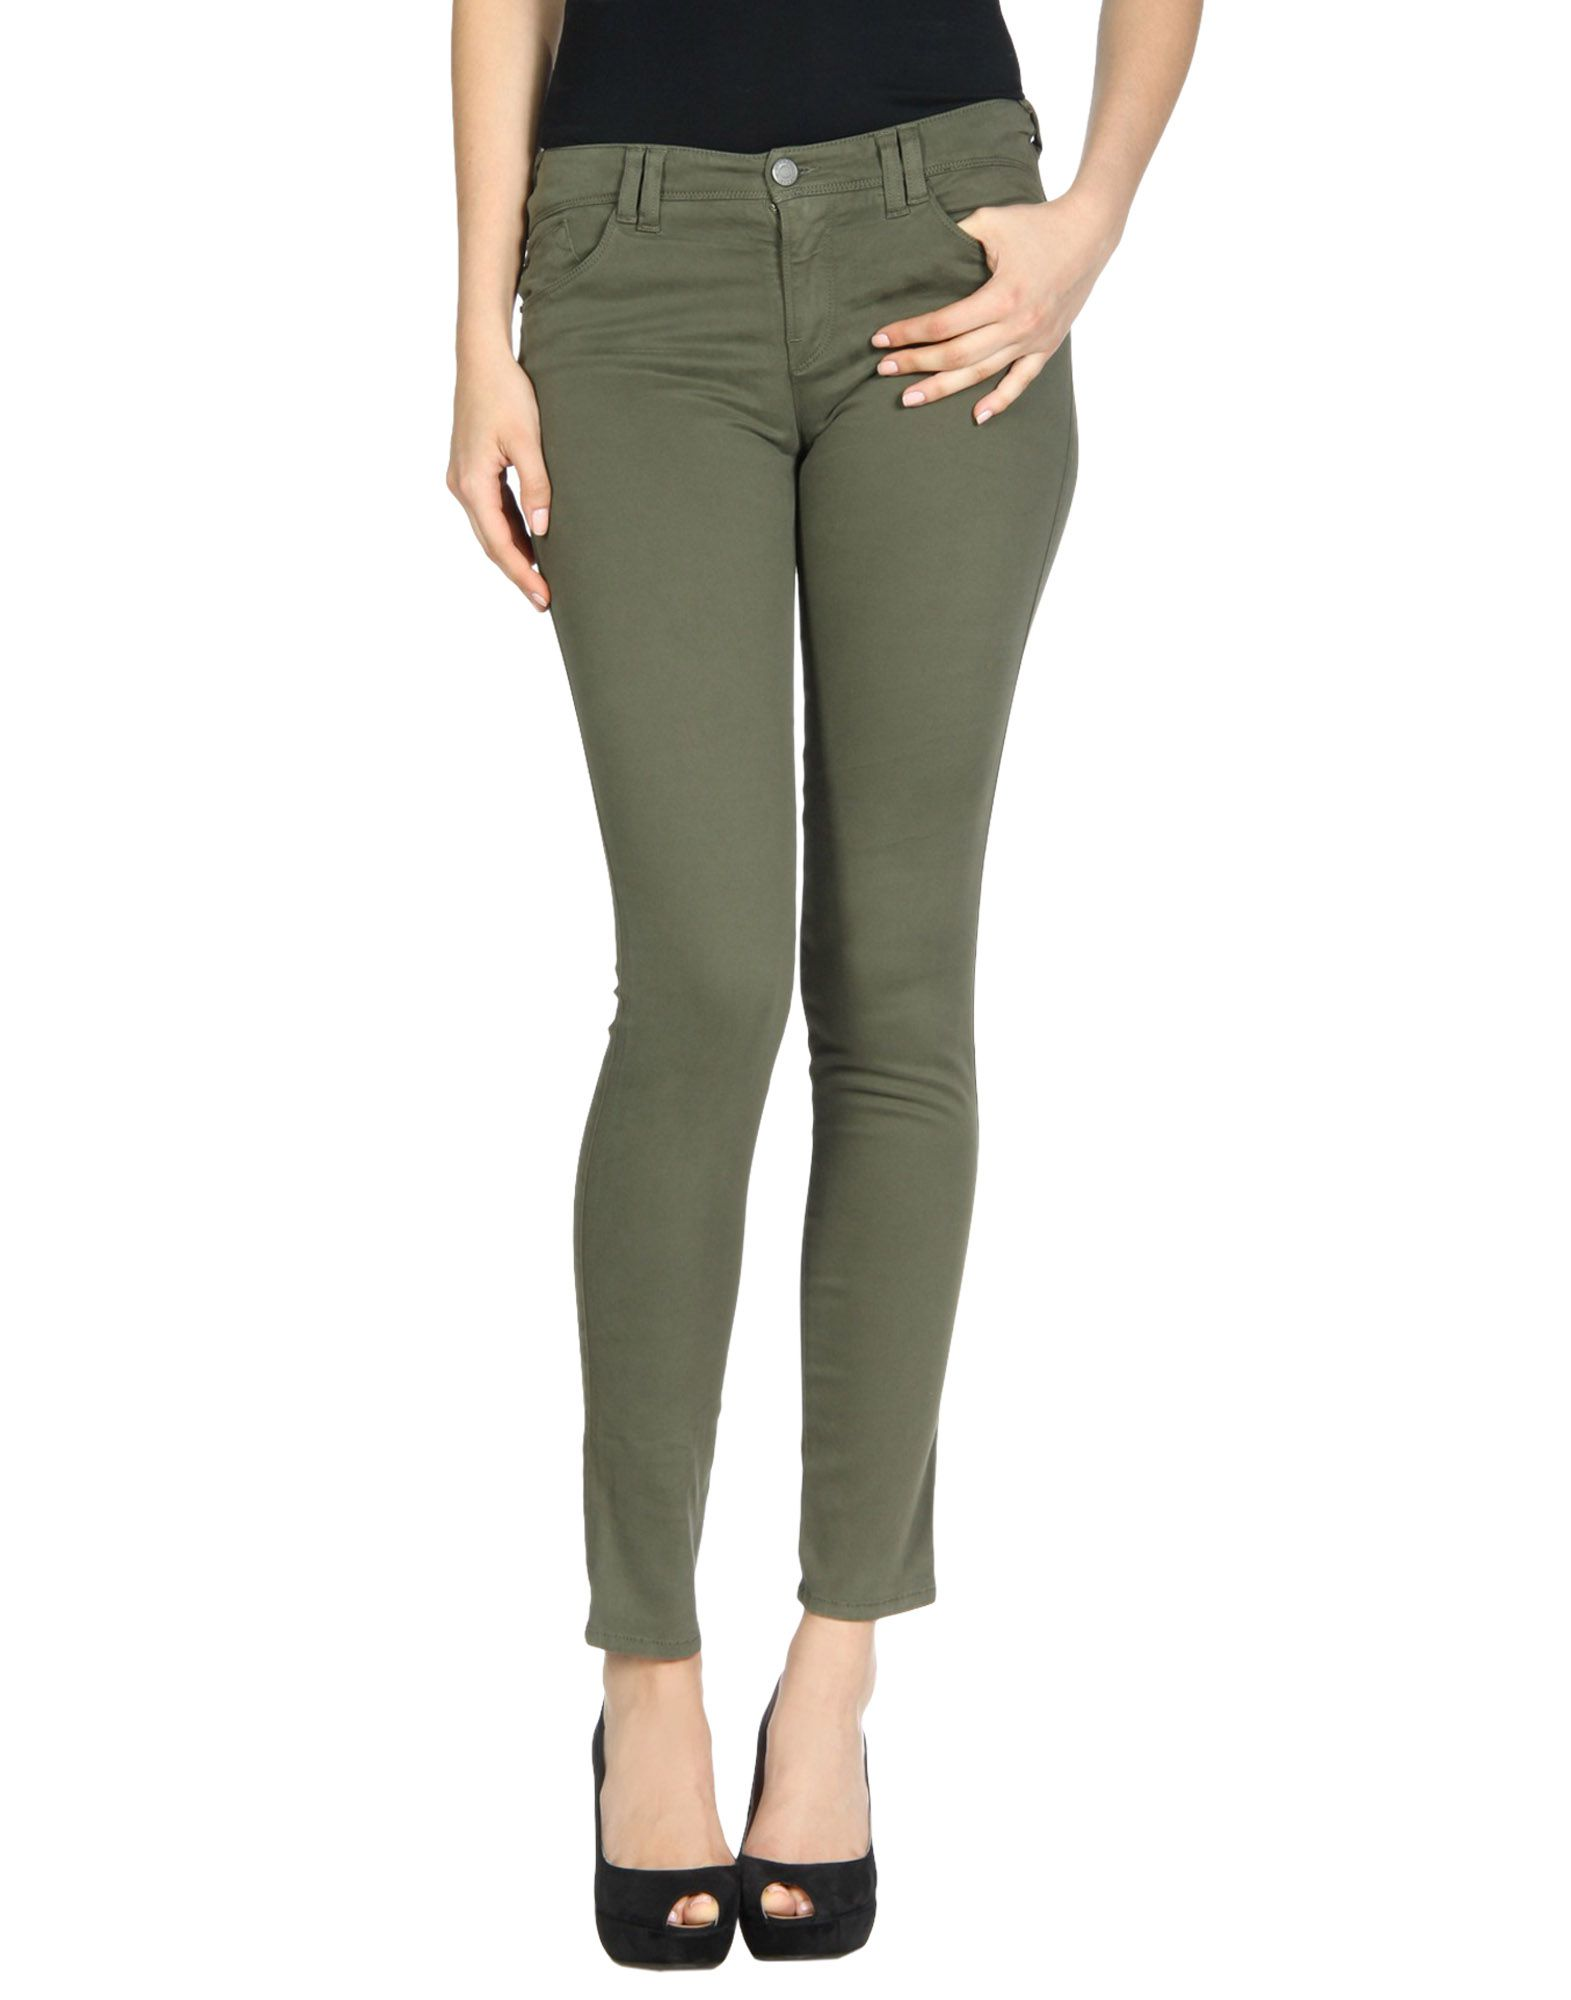 Pantalone Armani Armani Armani Jeans donna - 13080031VJ b0c